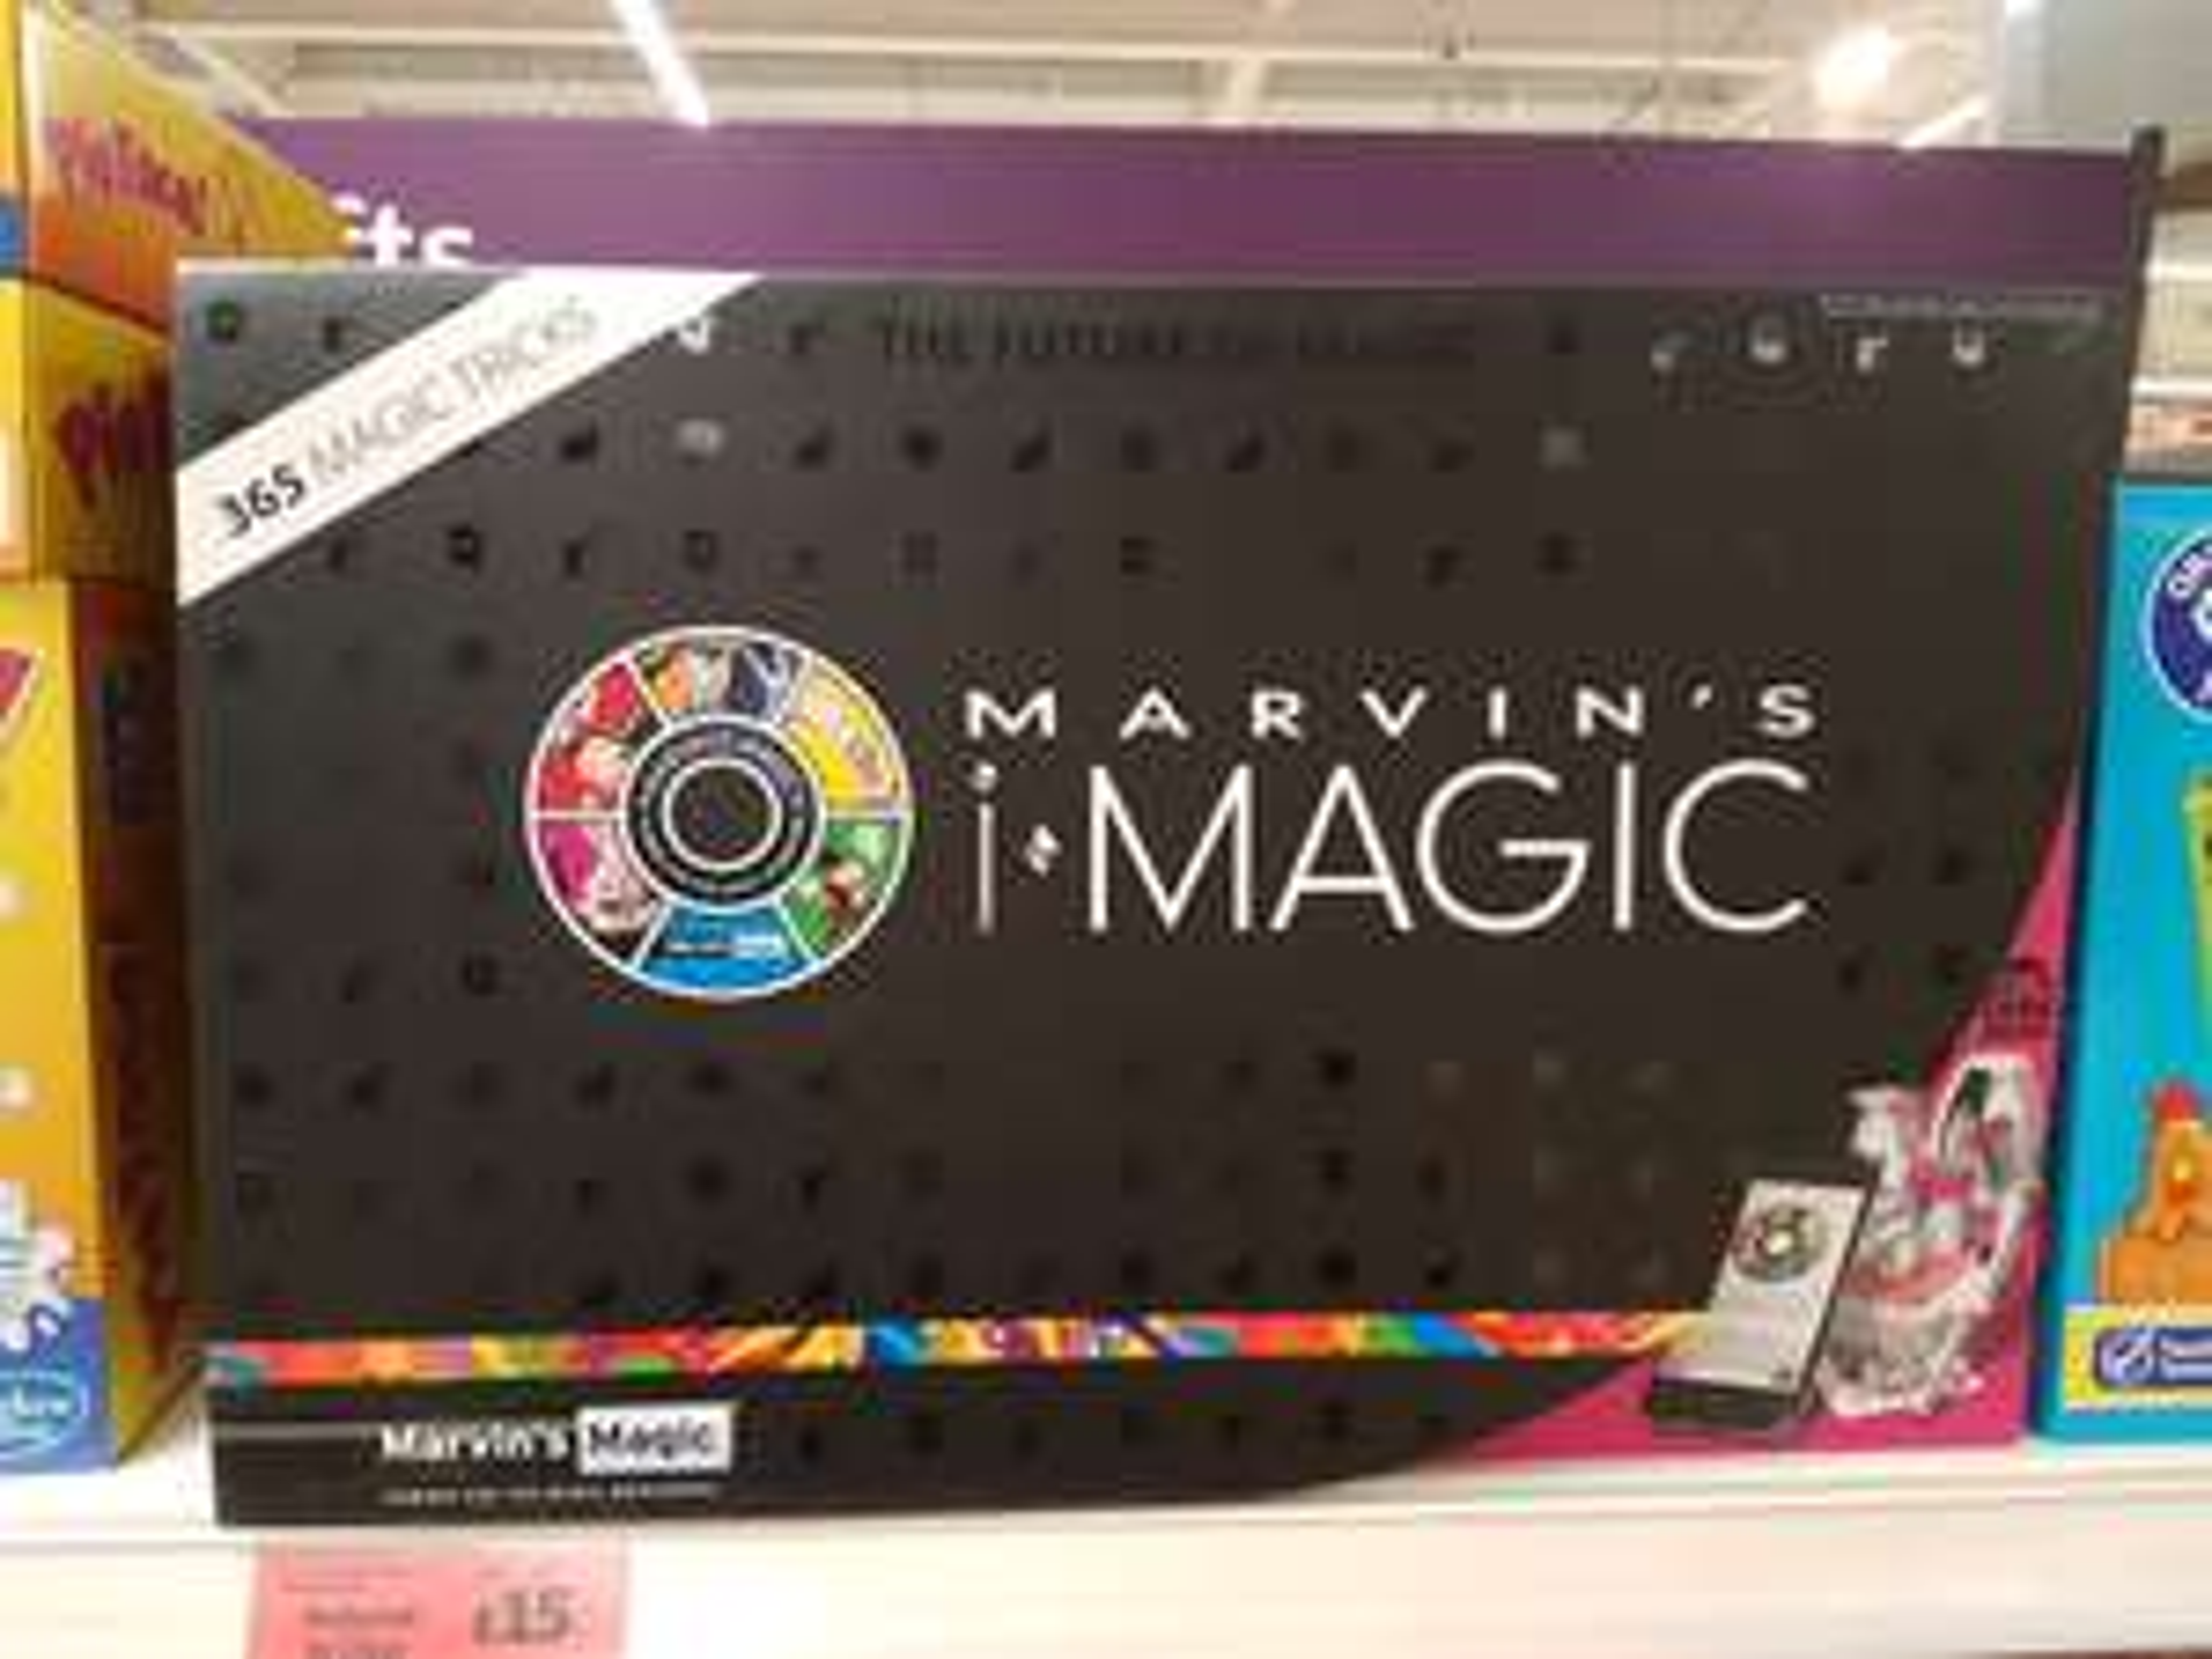 Marvins magic... was £50, now £15 instore @ Sainsbury's - pepper hill store northfleet